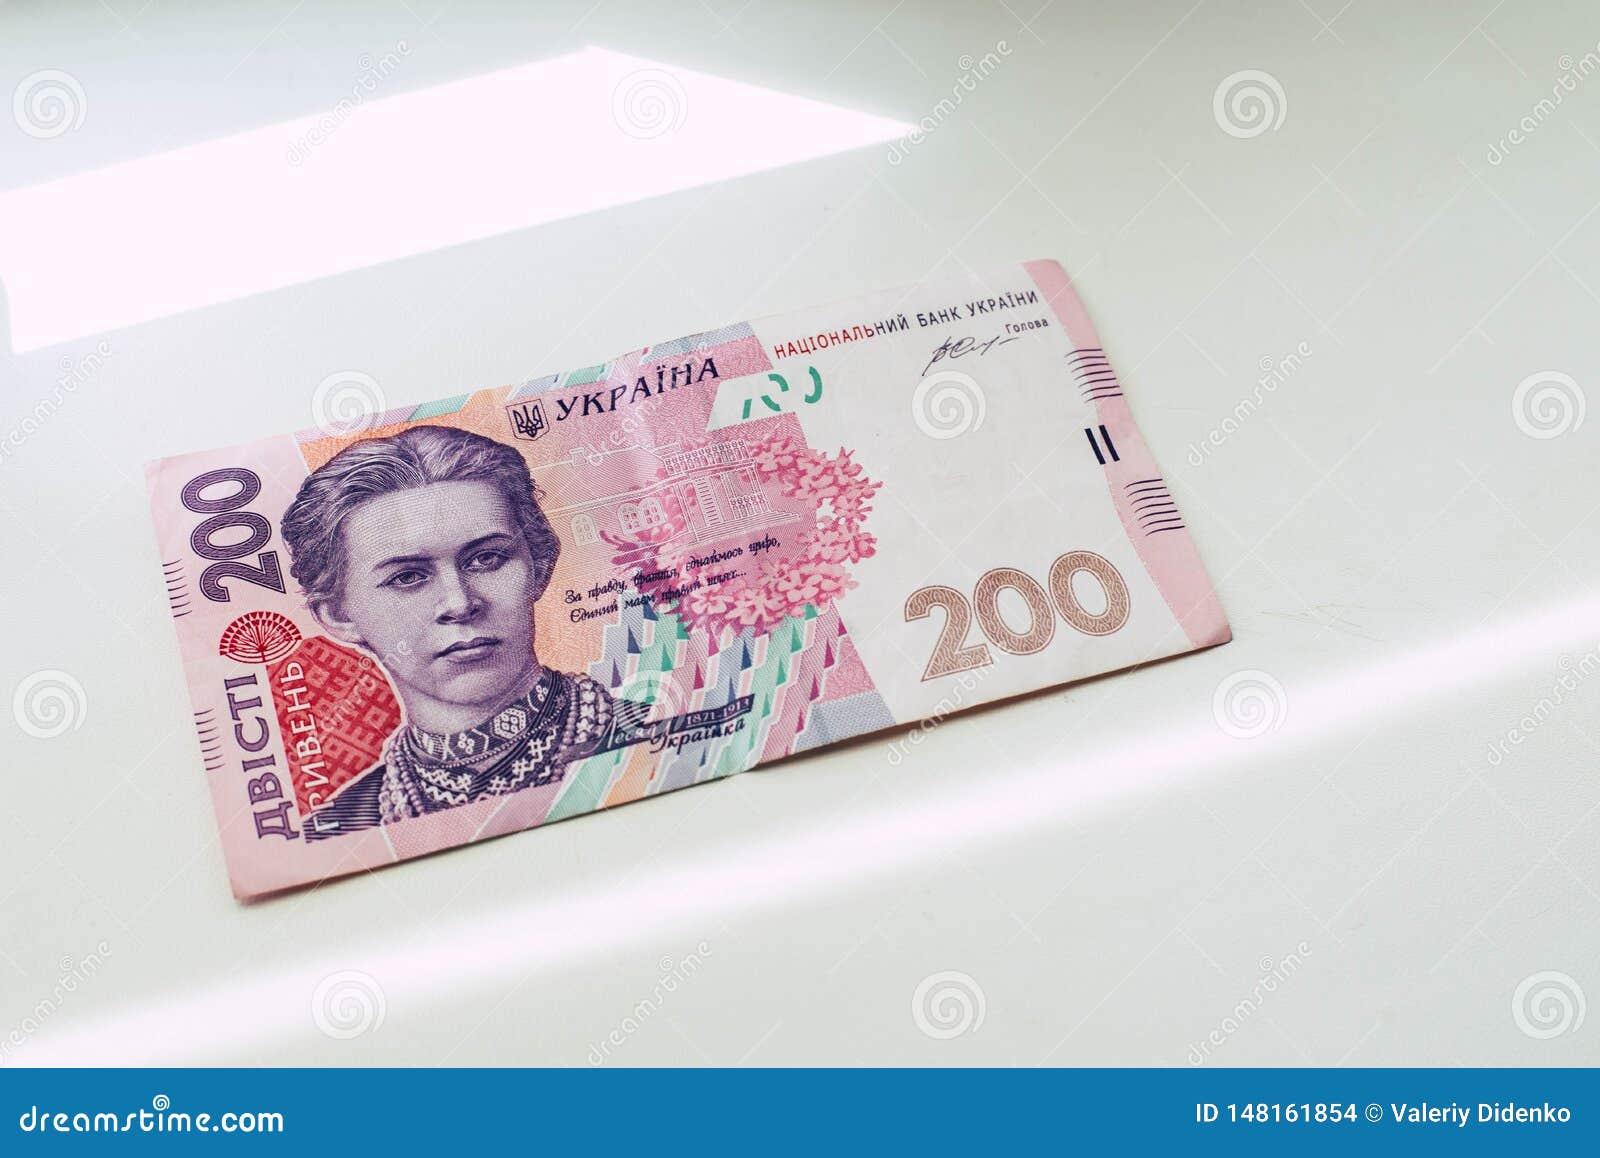 Banconota in 200 hryvnias ucraini